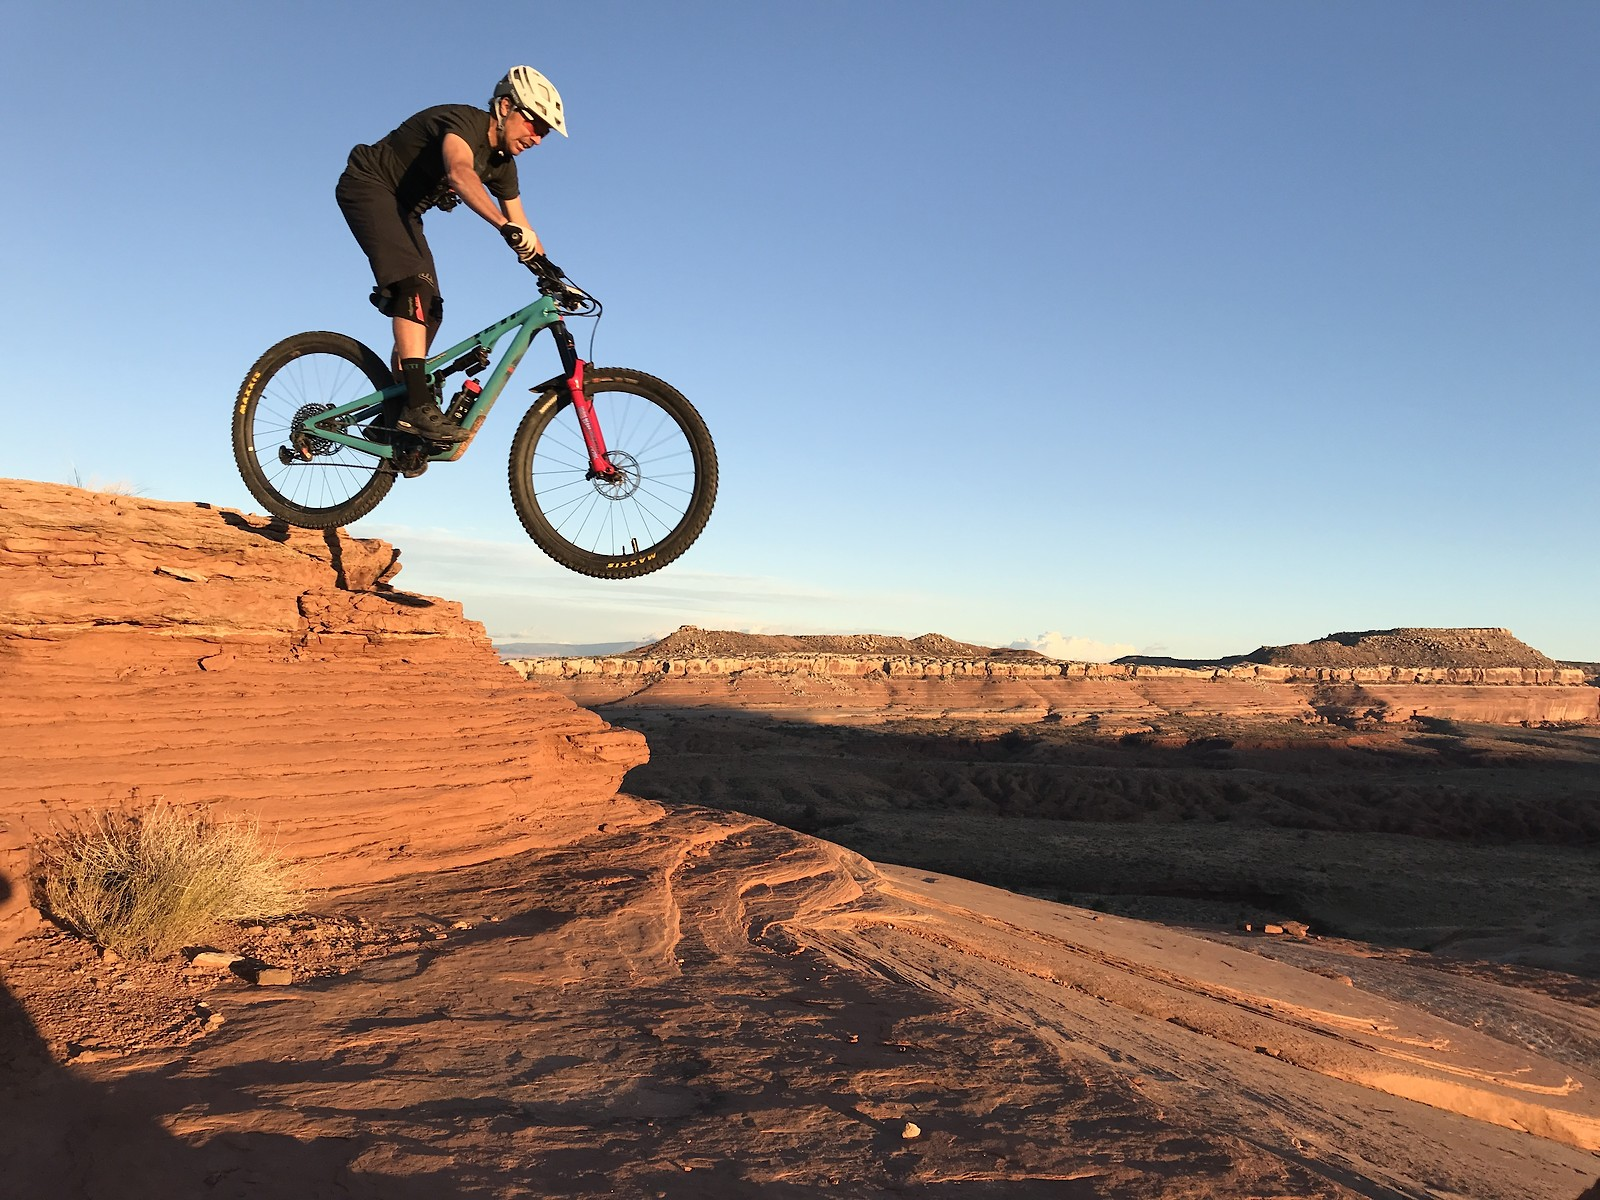 IMG 4020 - FlowyMcFlowerton - Mountain Biking Pictures - Vital MTB